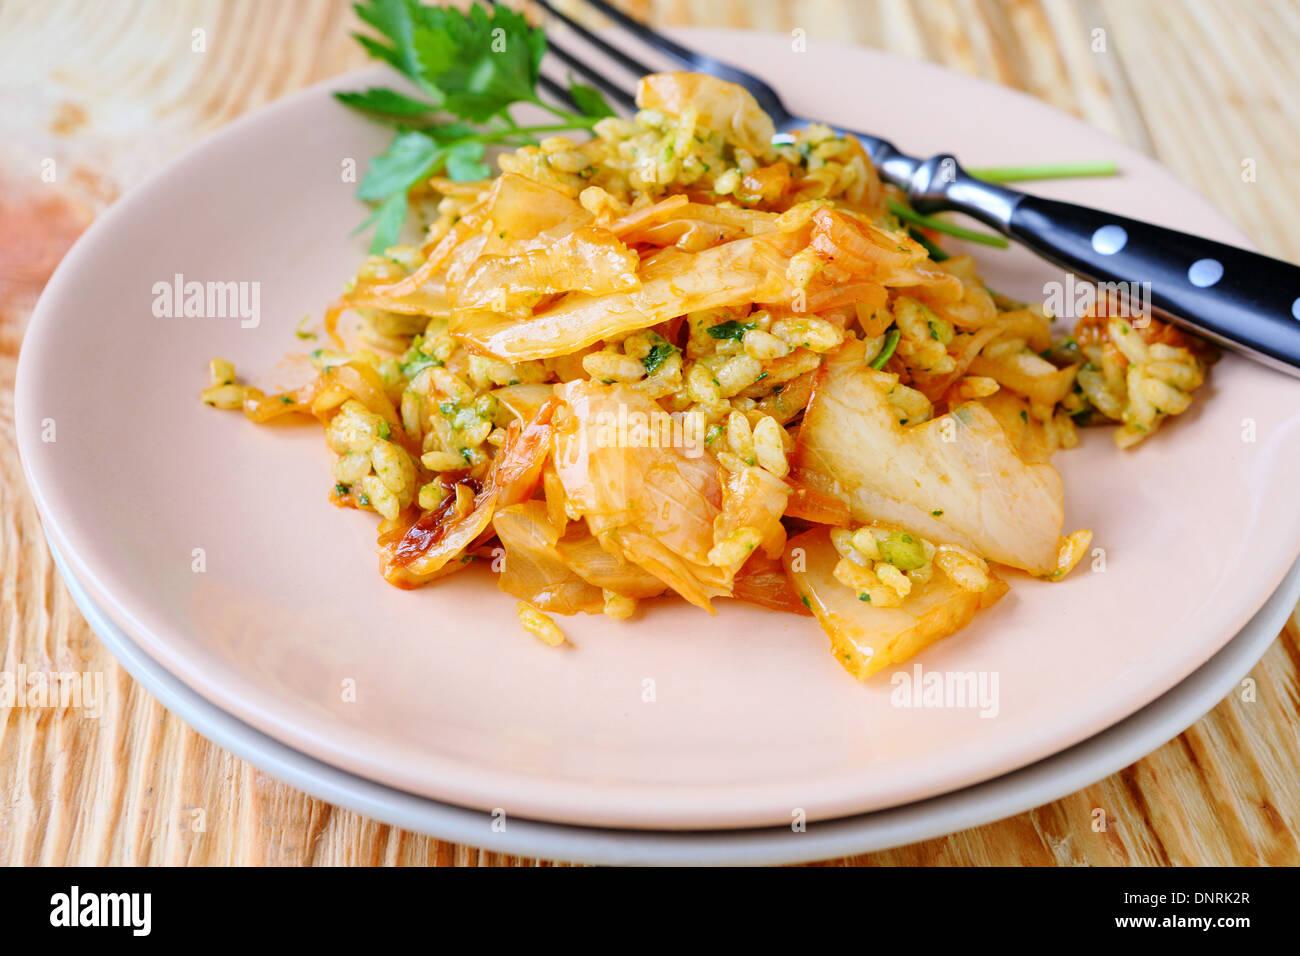 Italienische Risotto mit Kohl, Essen Nahaufnahme Stockbild